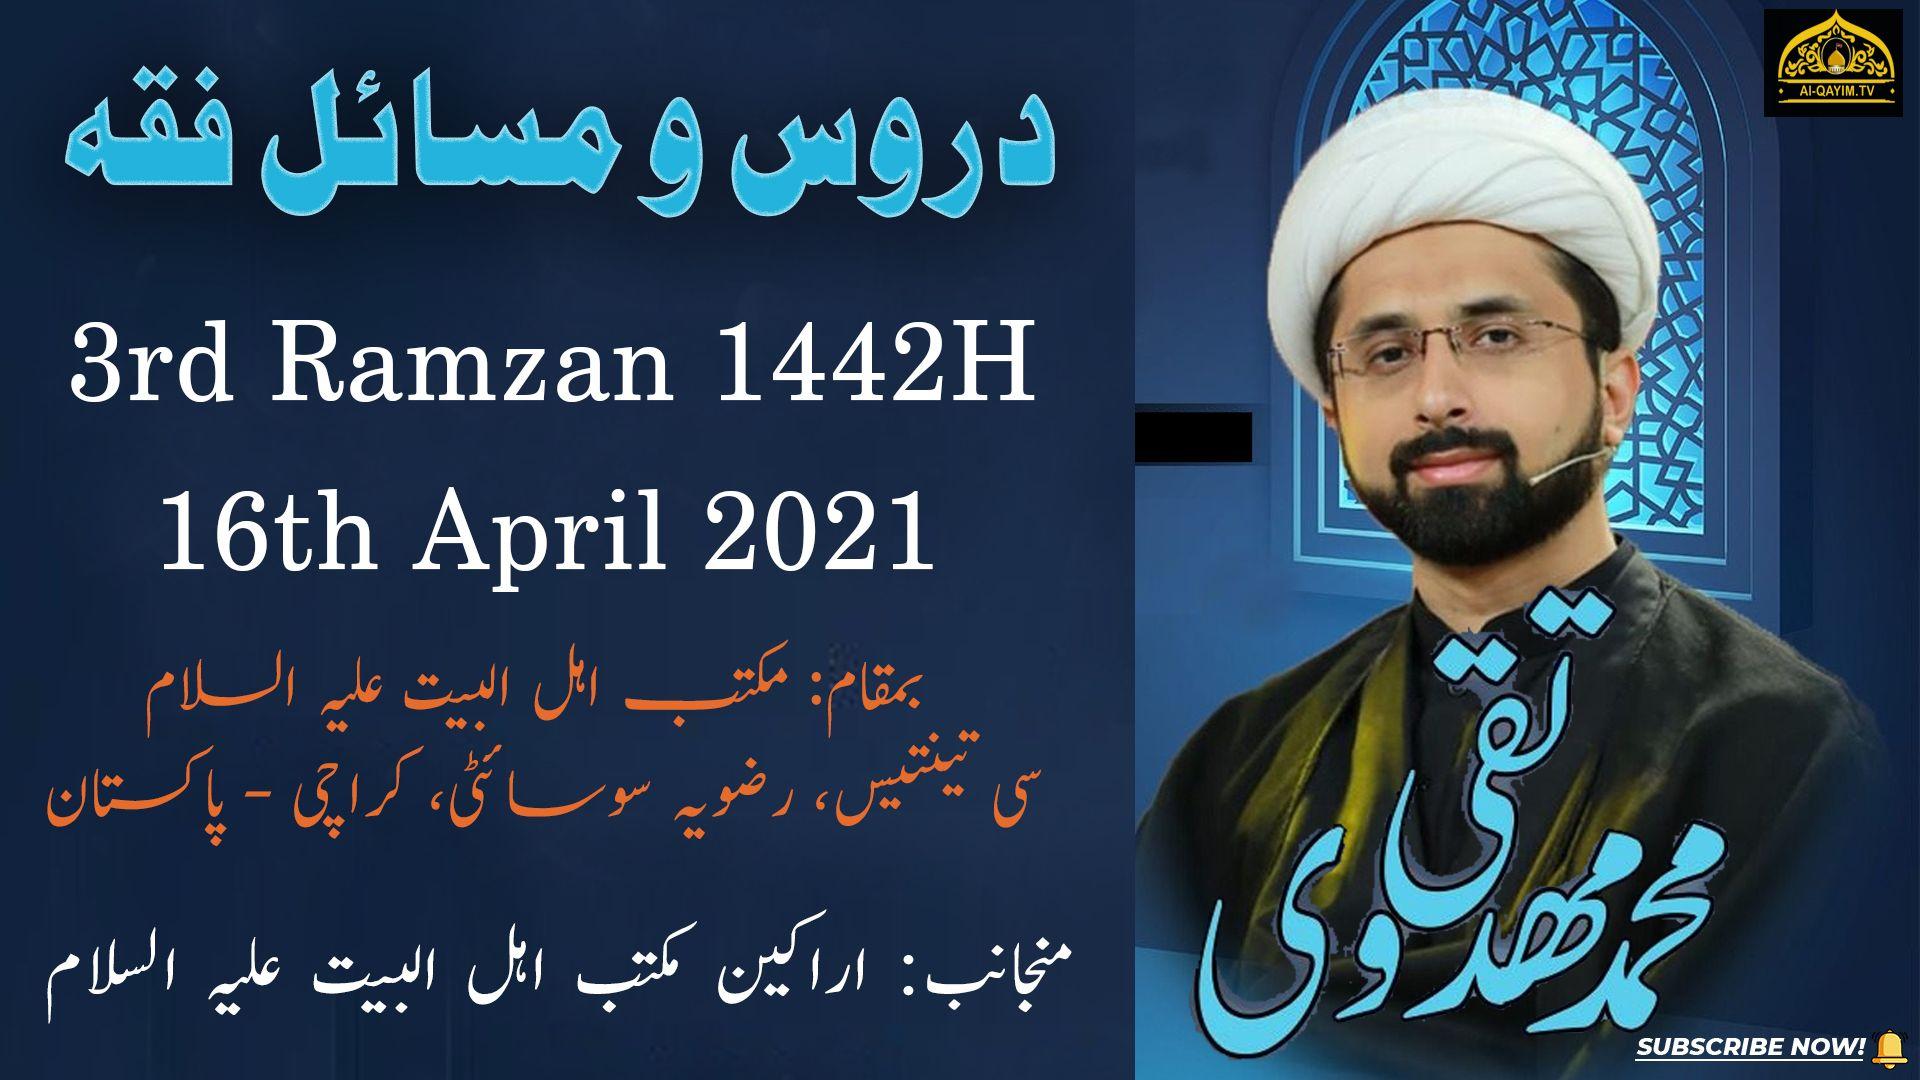 Moulana Muhammad Taqi Mehdavi | Dars Wo Masail Fiqae | 3rd Ramzan 2021 | Maktab-e-Ahlebait - Karachi